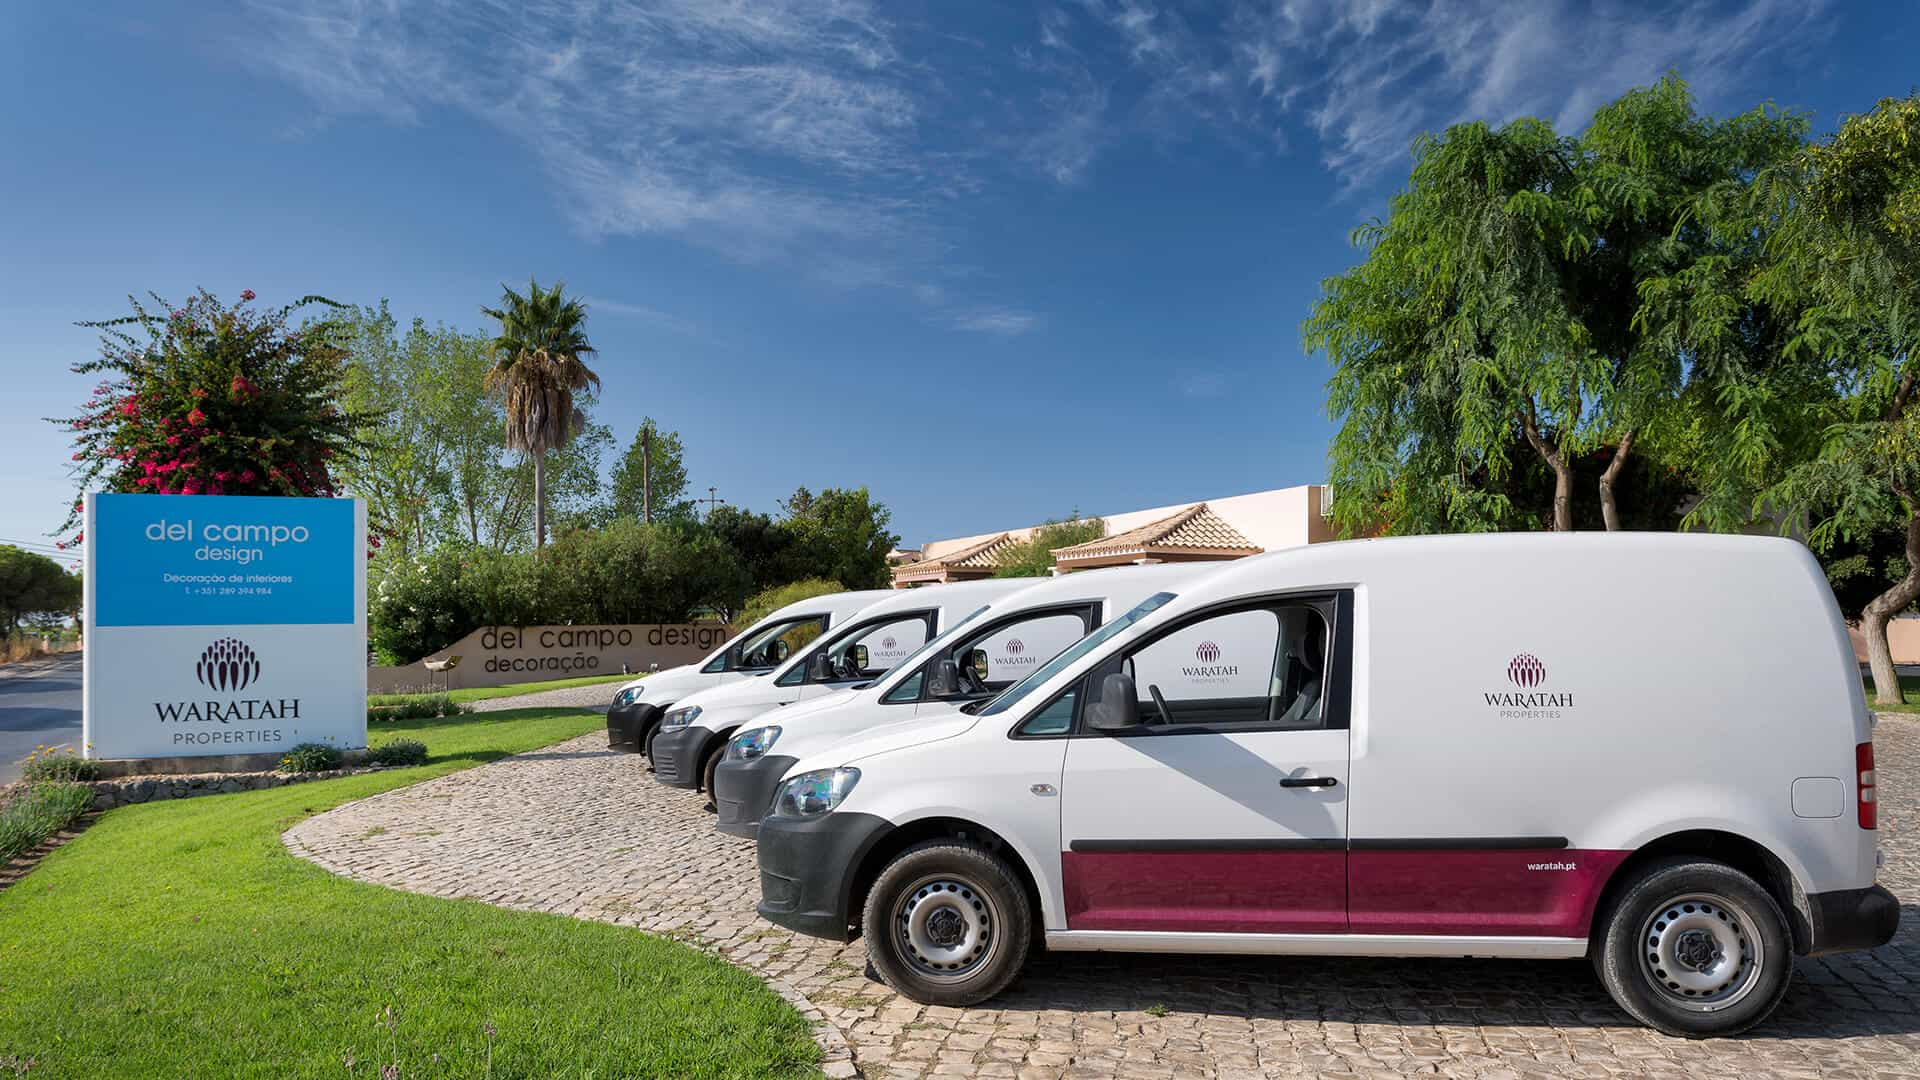 waratah rentals guest services algarve